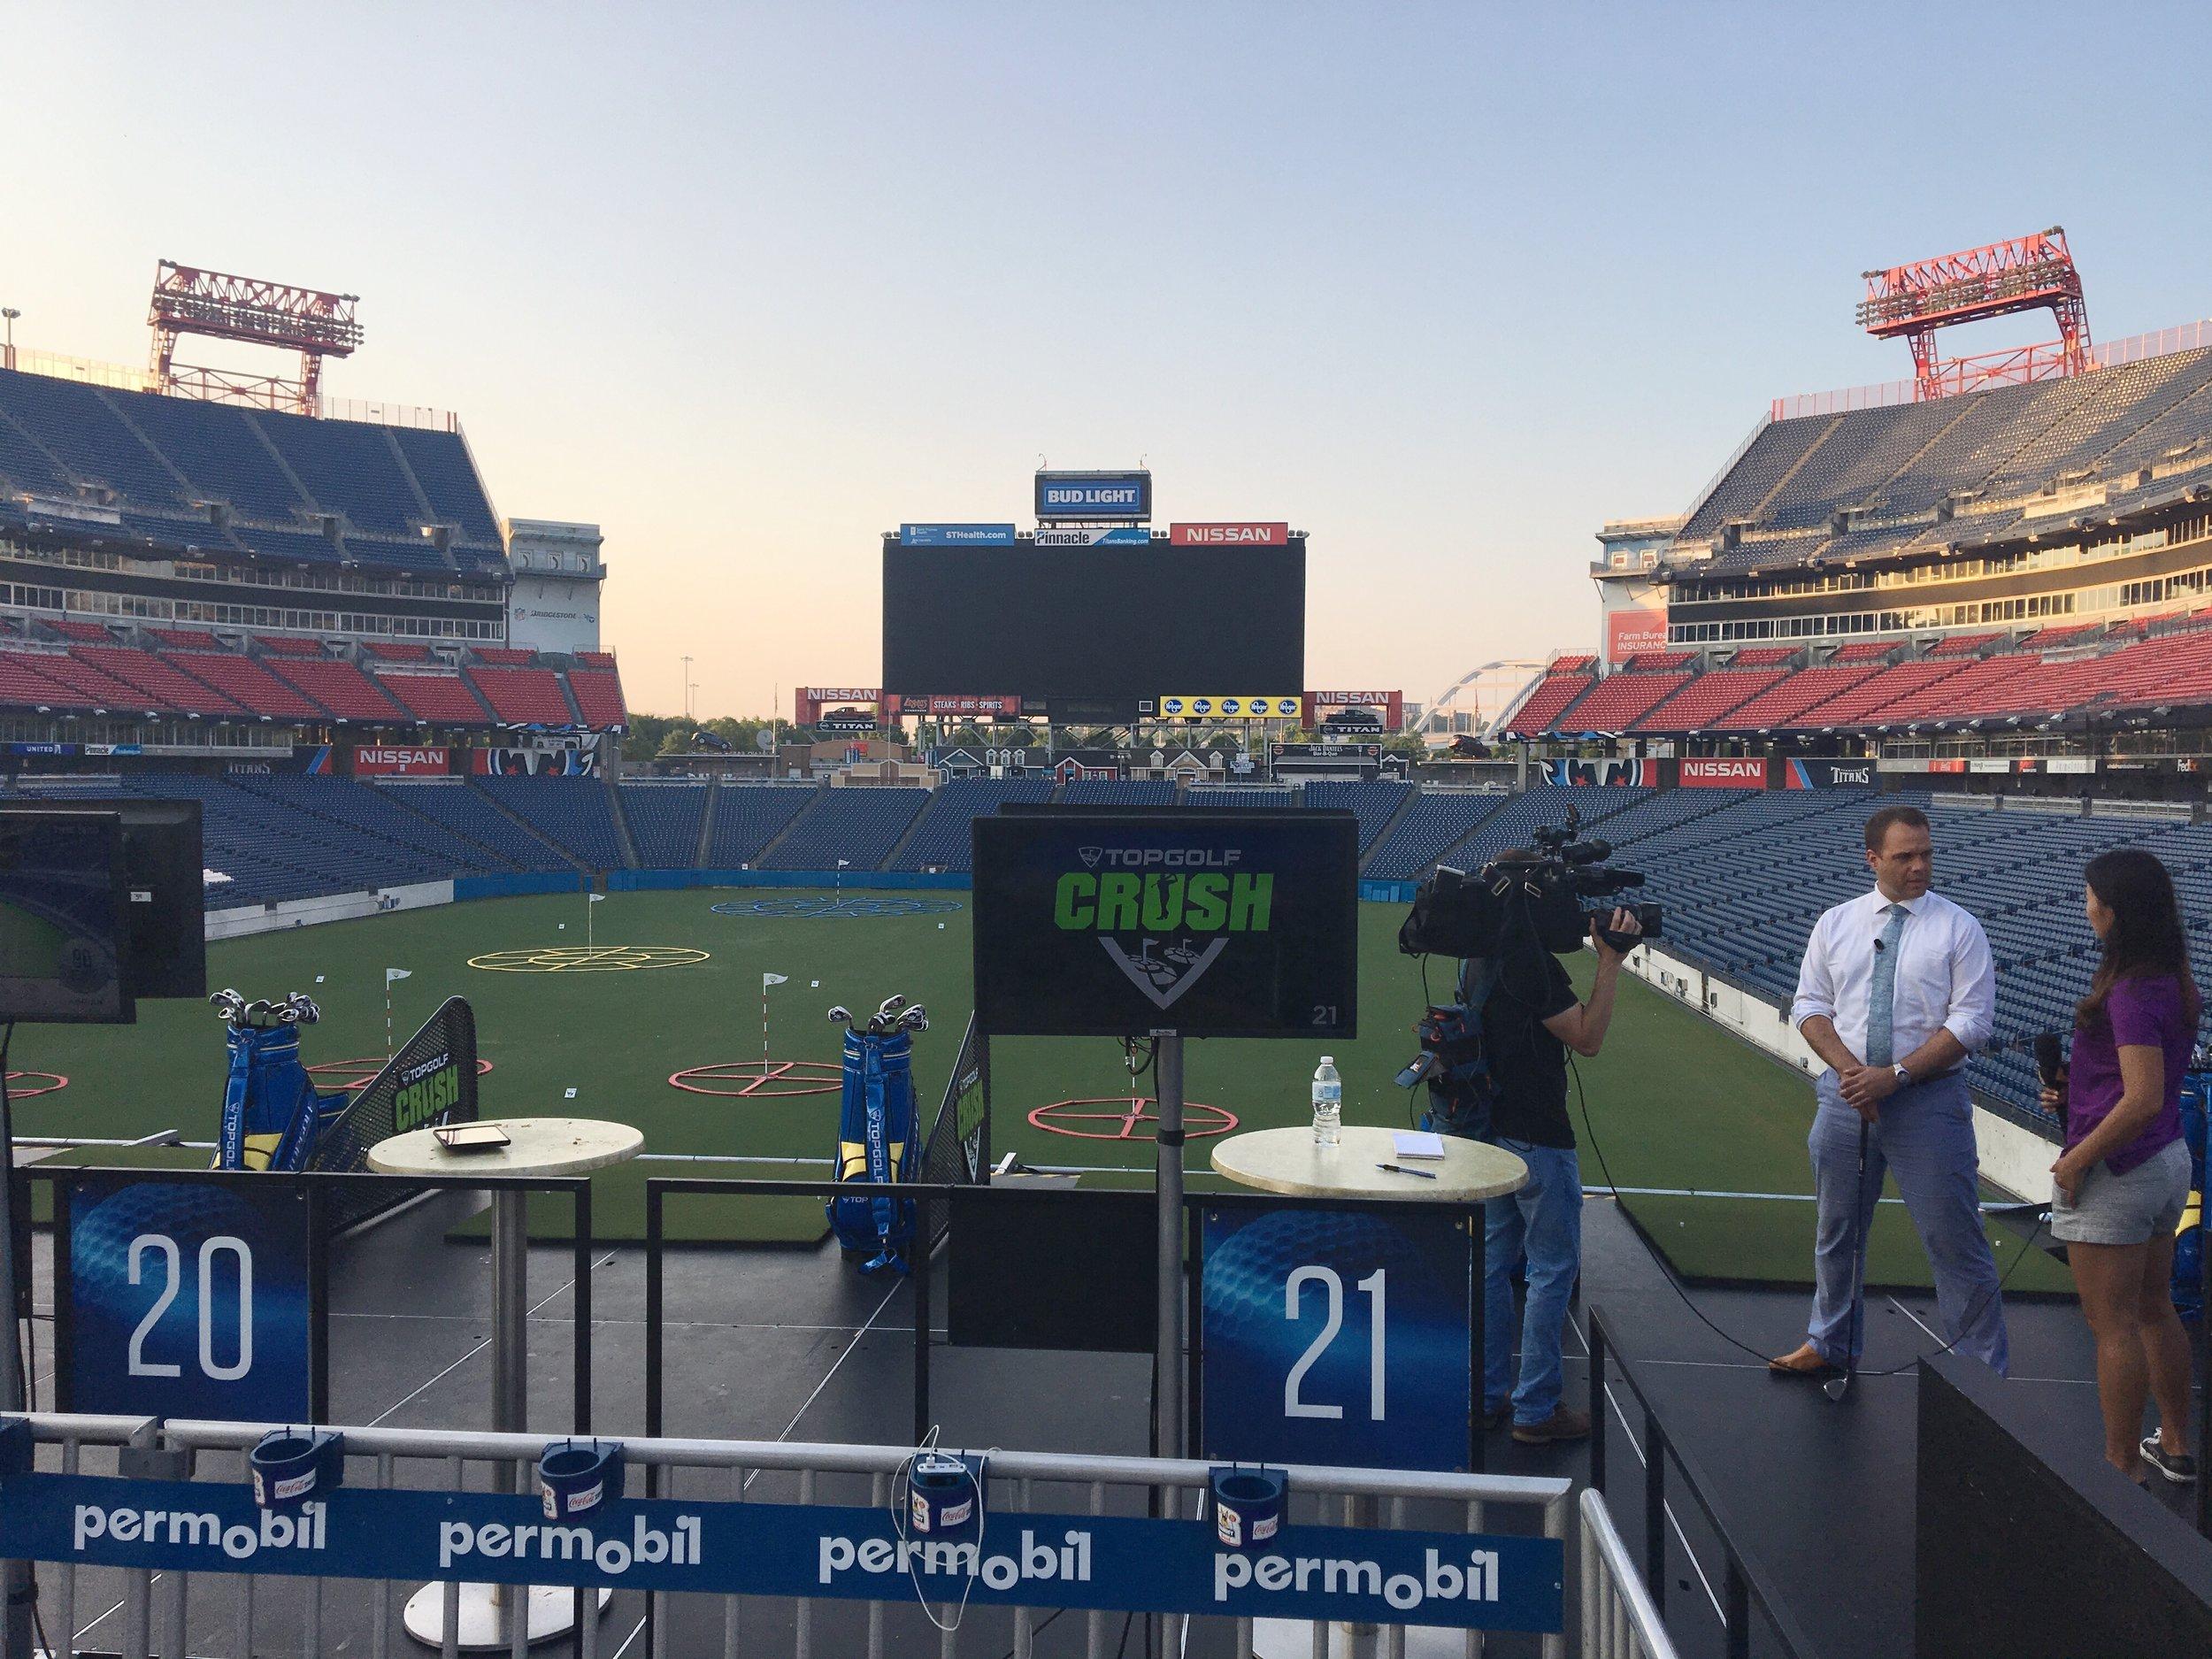 Topgolf Crush at Nissan Stadium in Nashville